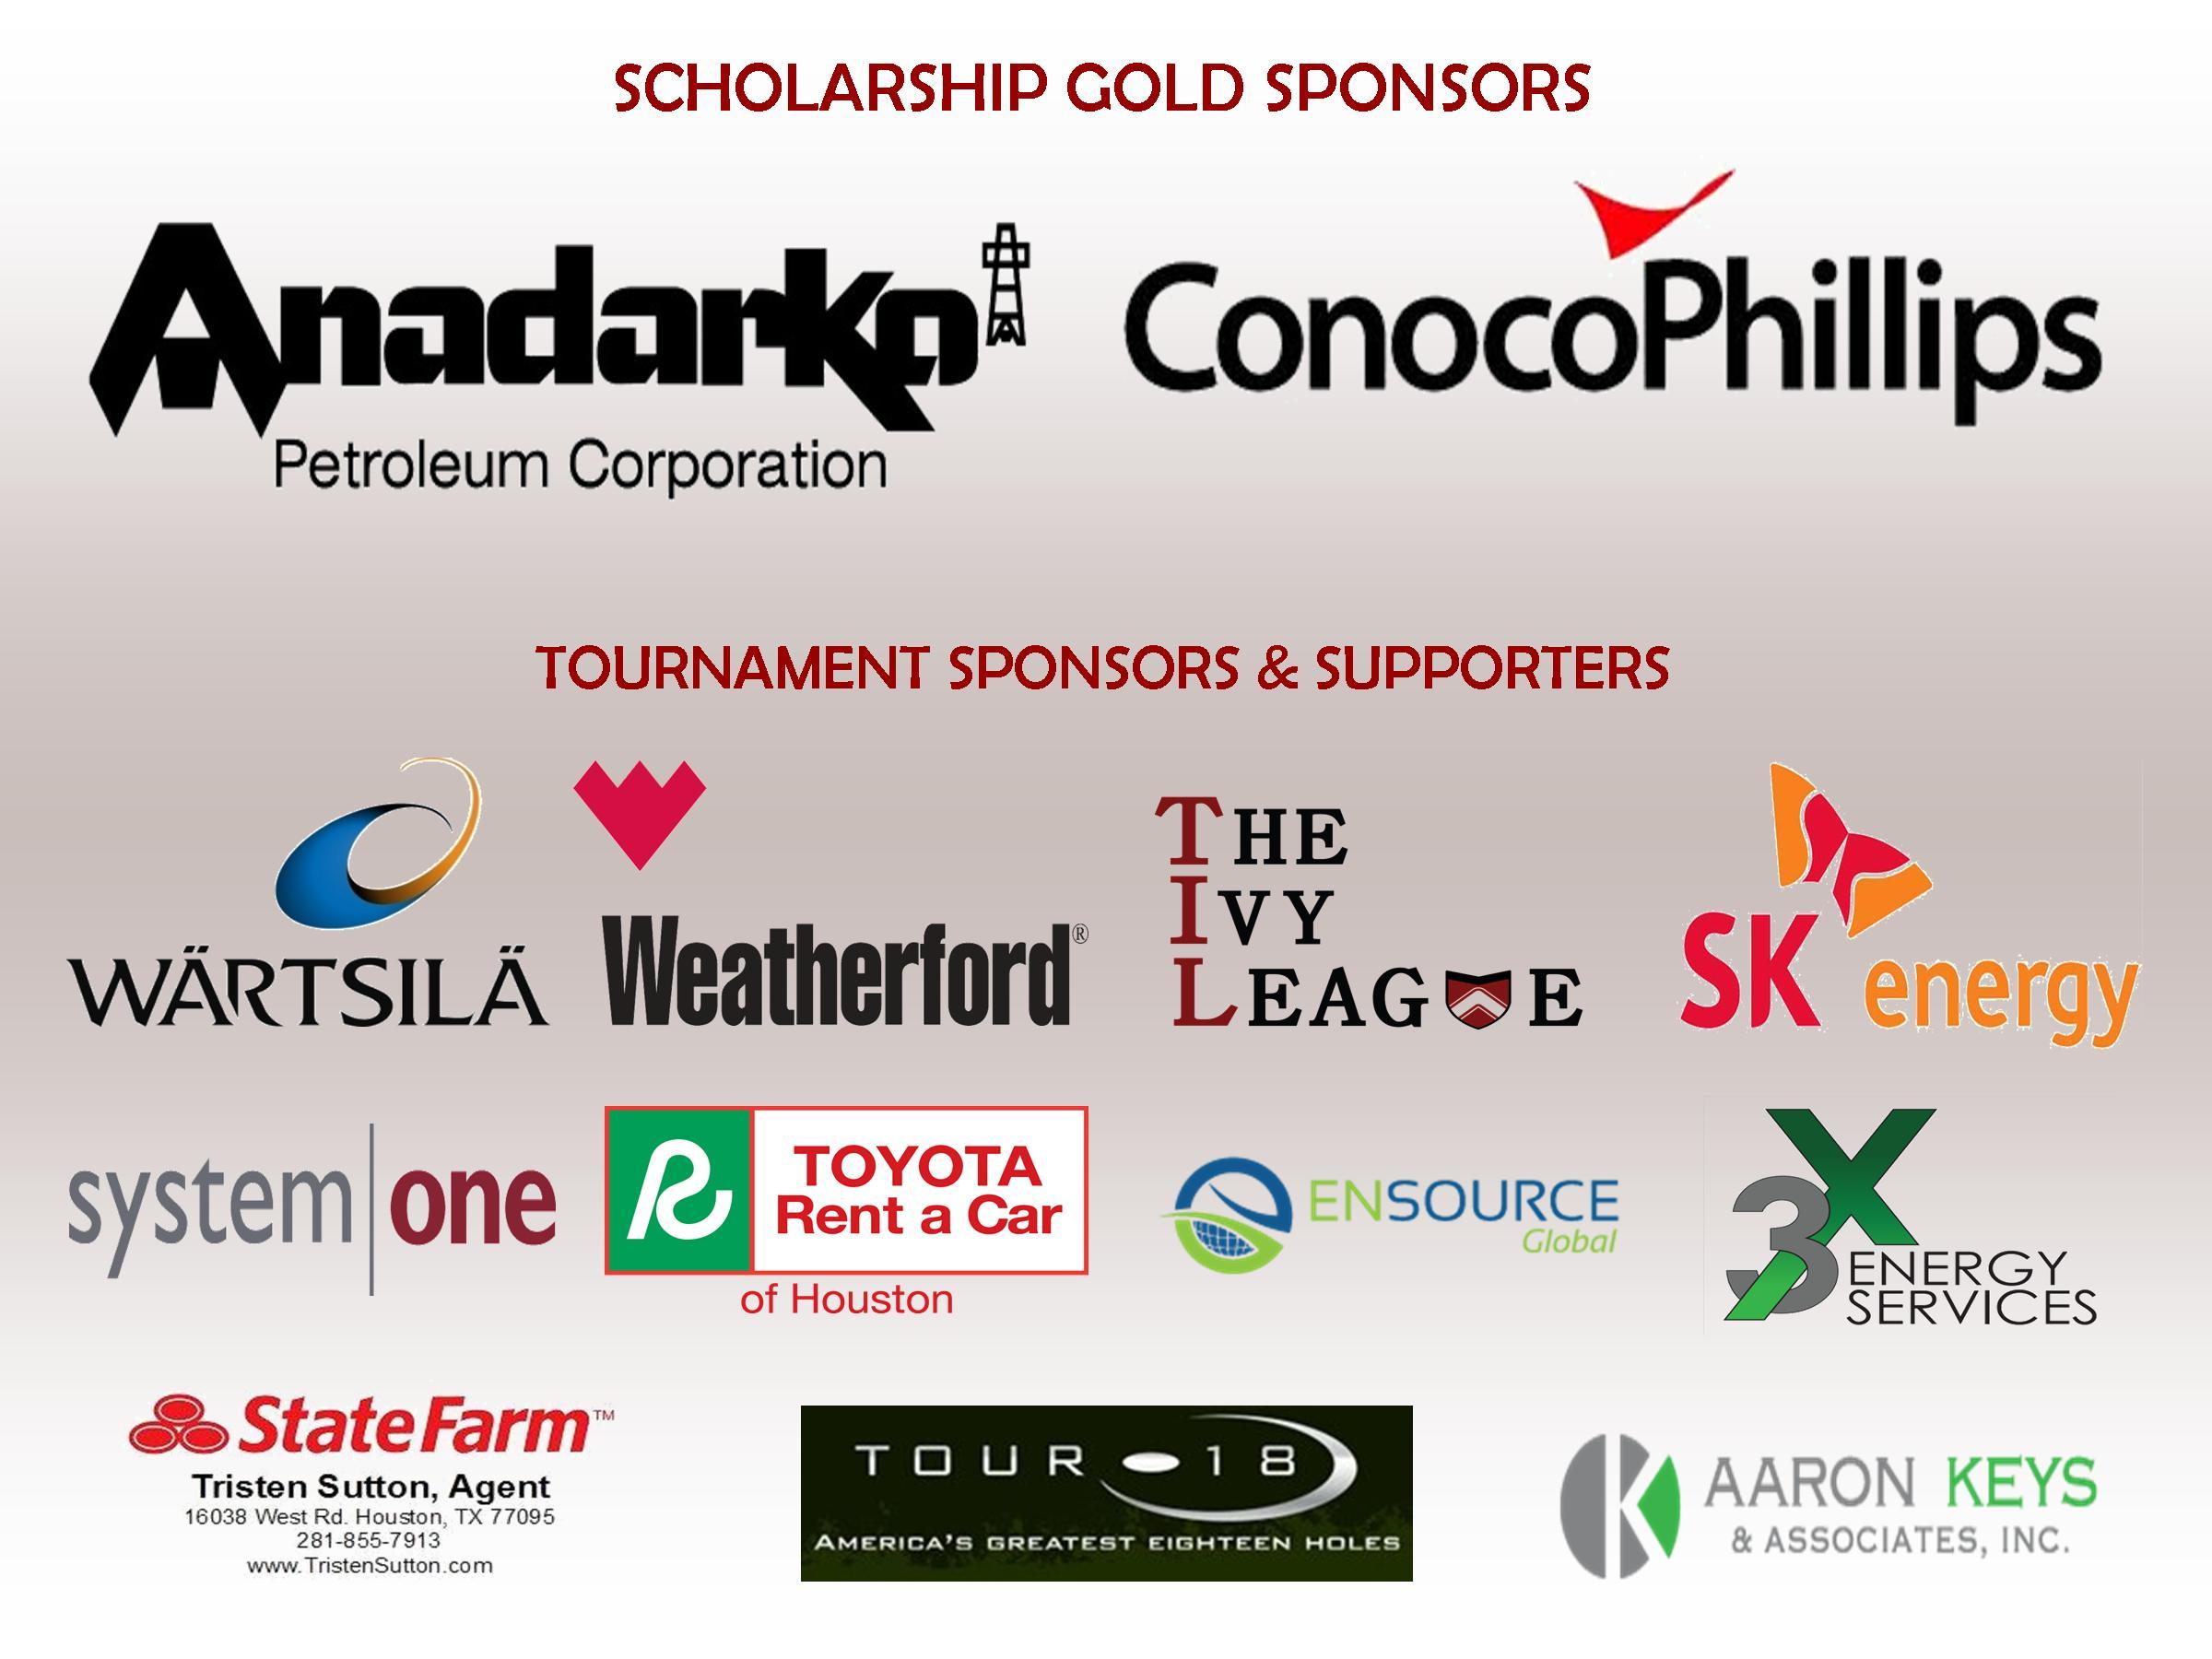 AABE Houston 2014 Golf Tourney Sponsors